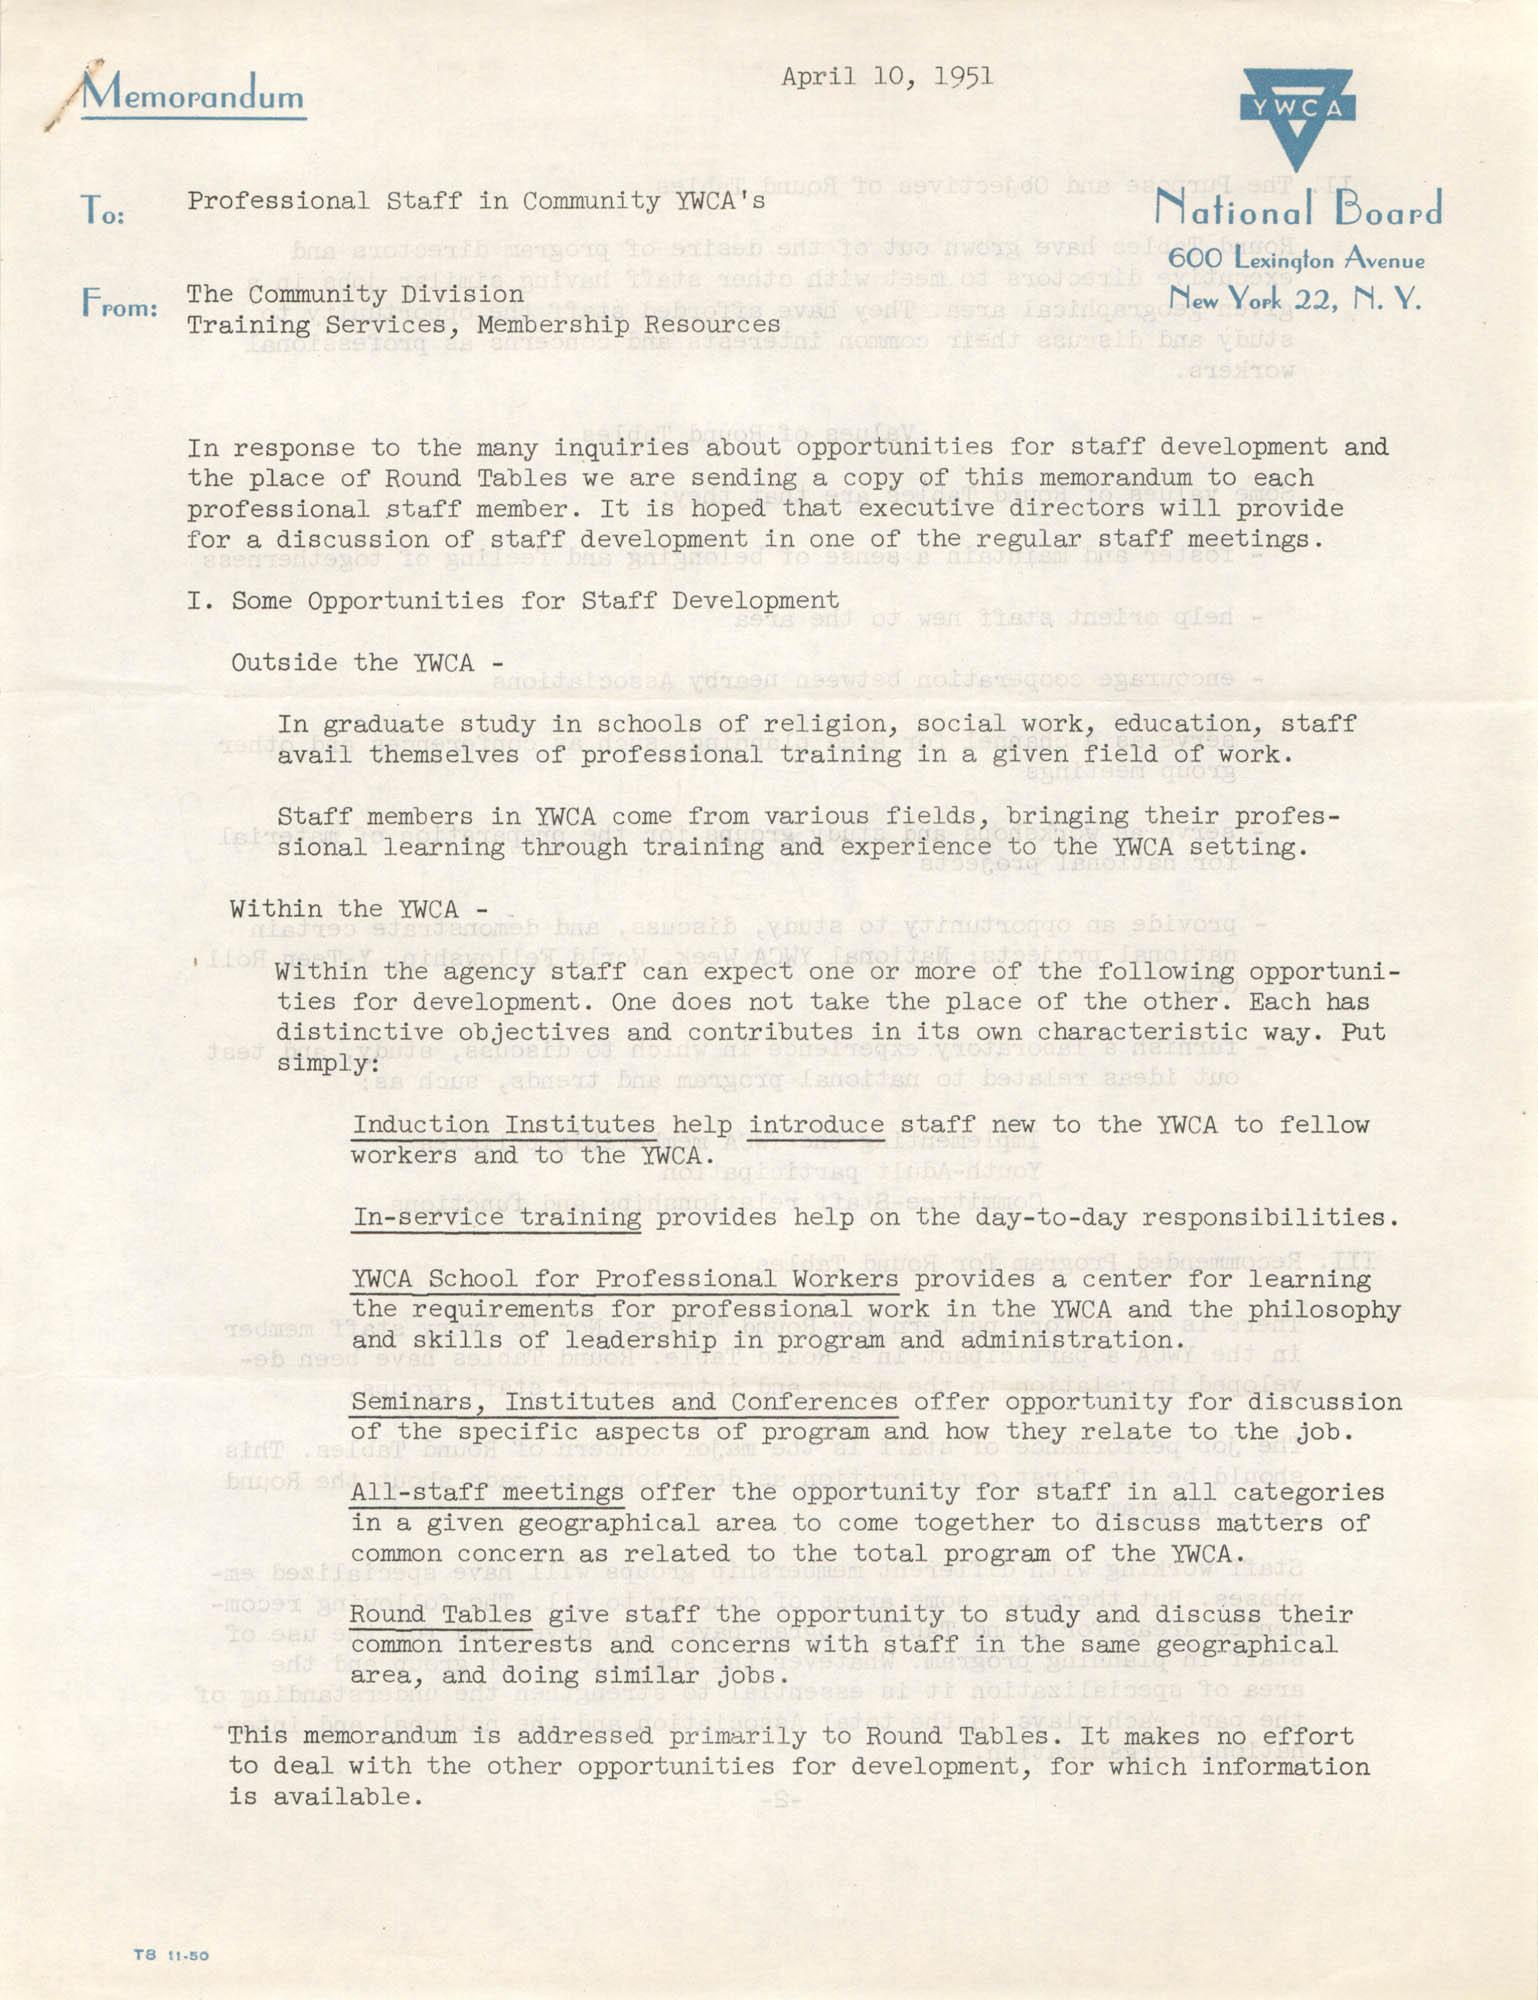 National Board of the Y.W.C.A. Memorandum, April 10, 1951